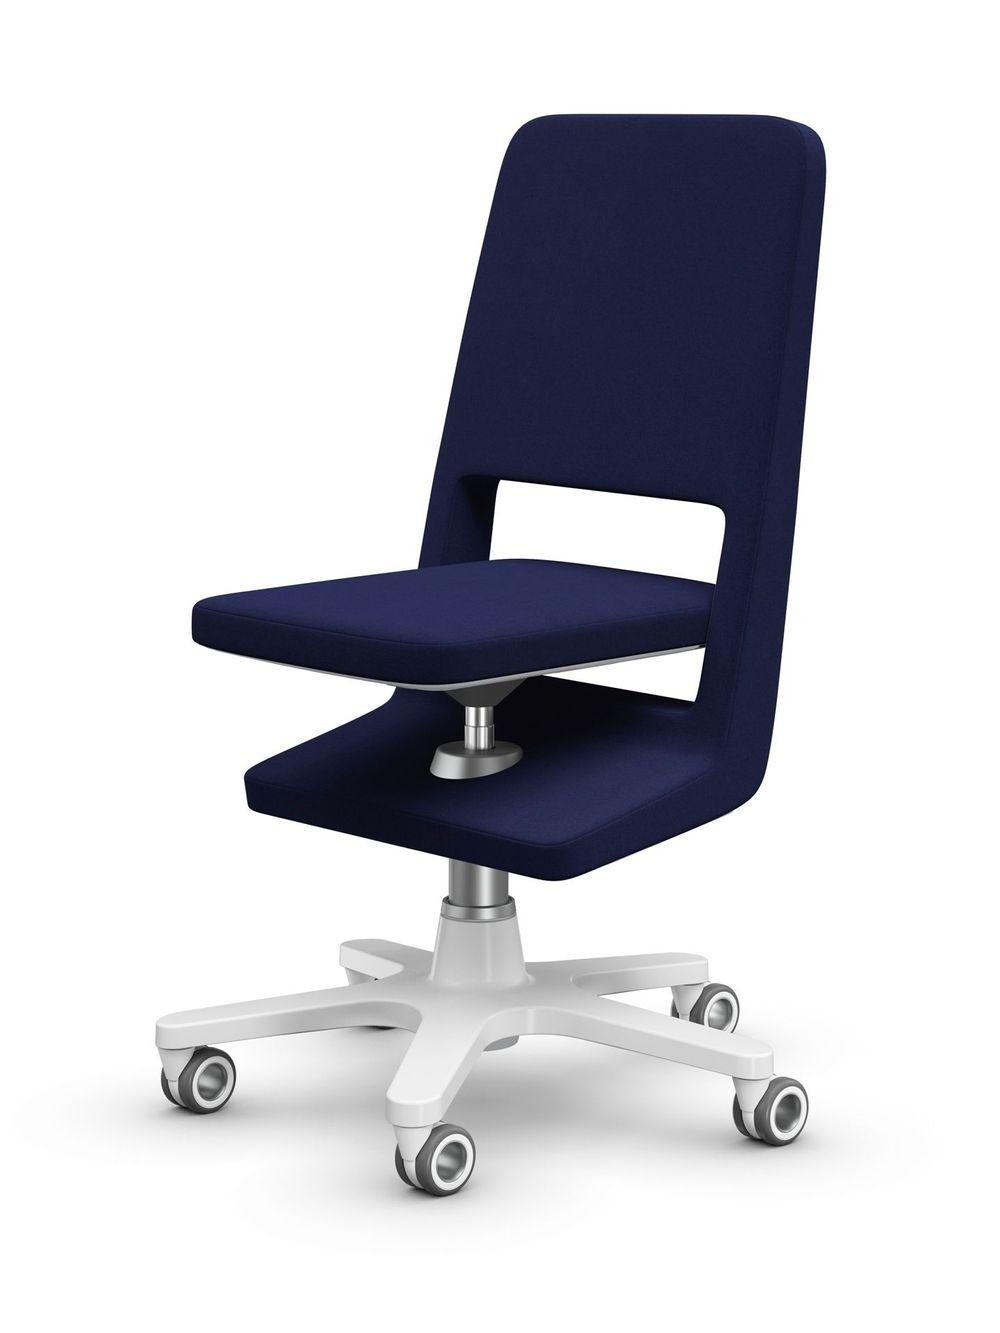 Sedia ergonomica S9 Moll